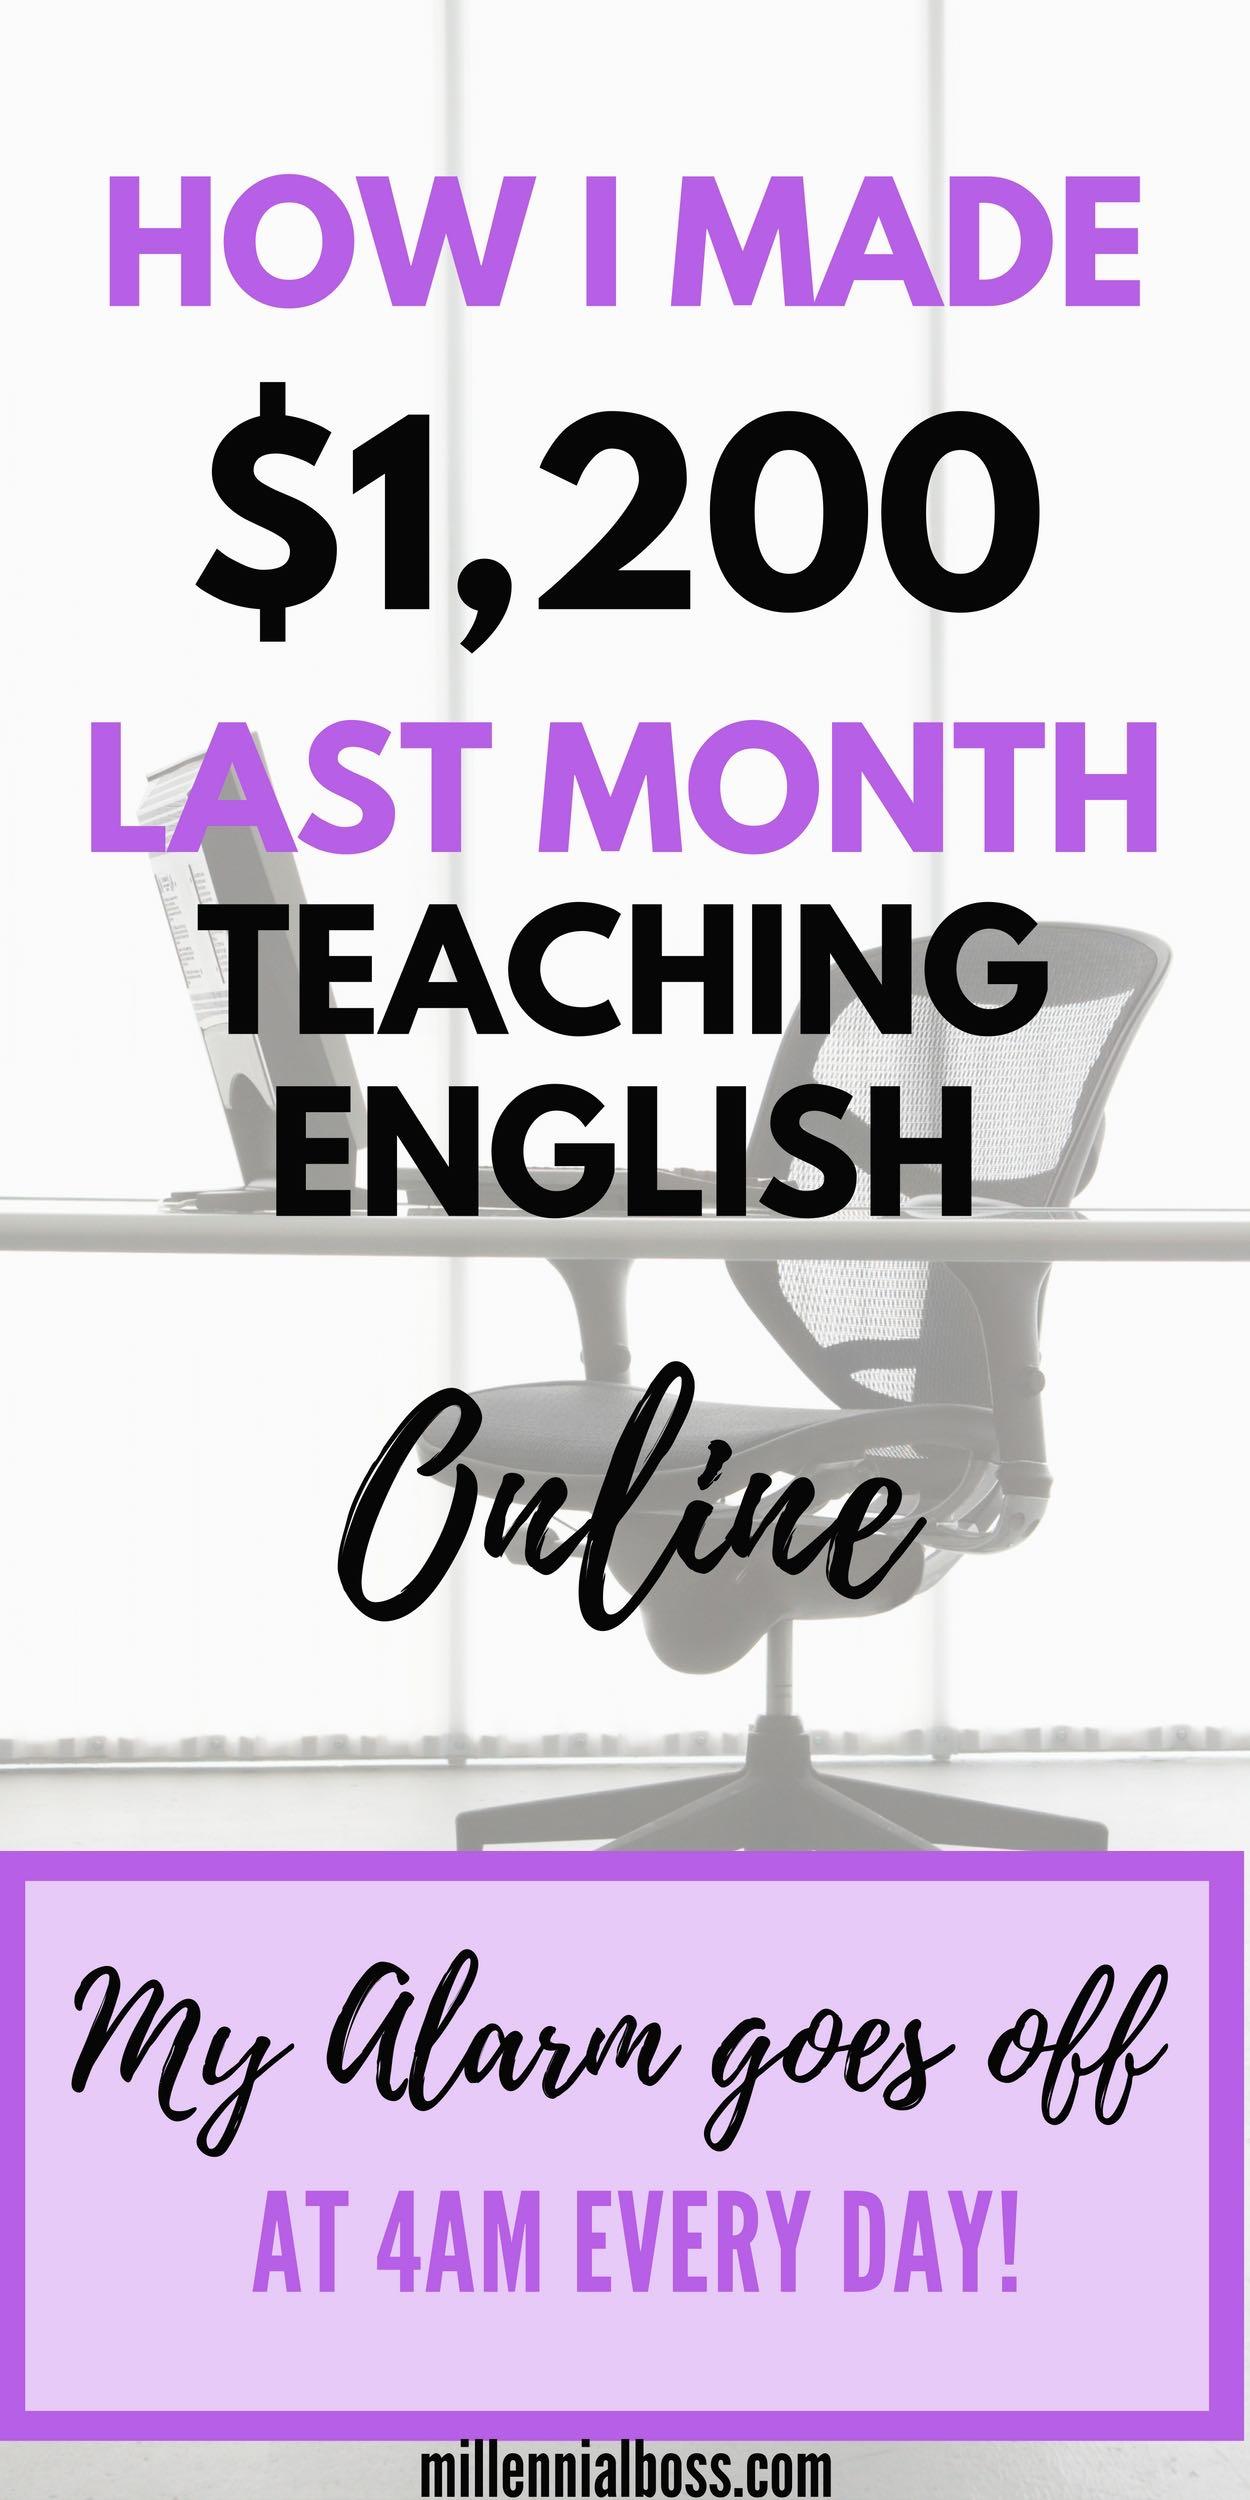 Have you considered teaching English online? I make money teaching kids how to speak English.